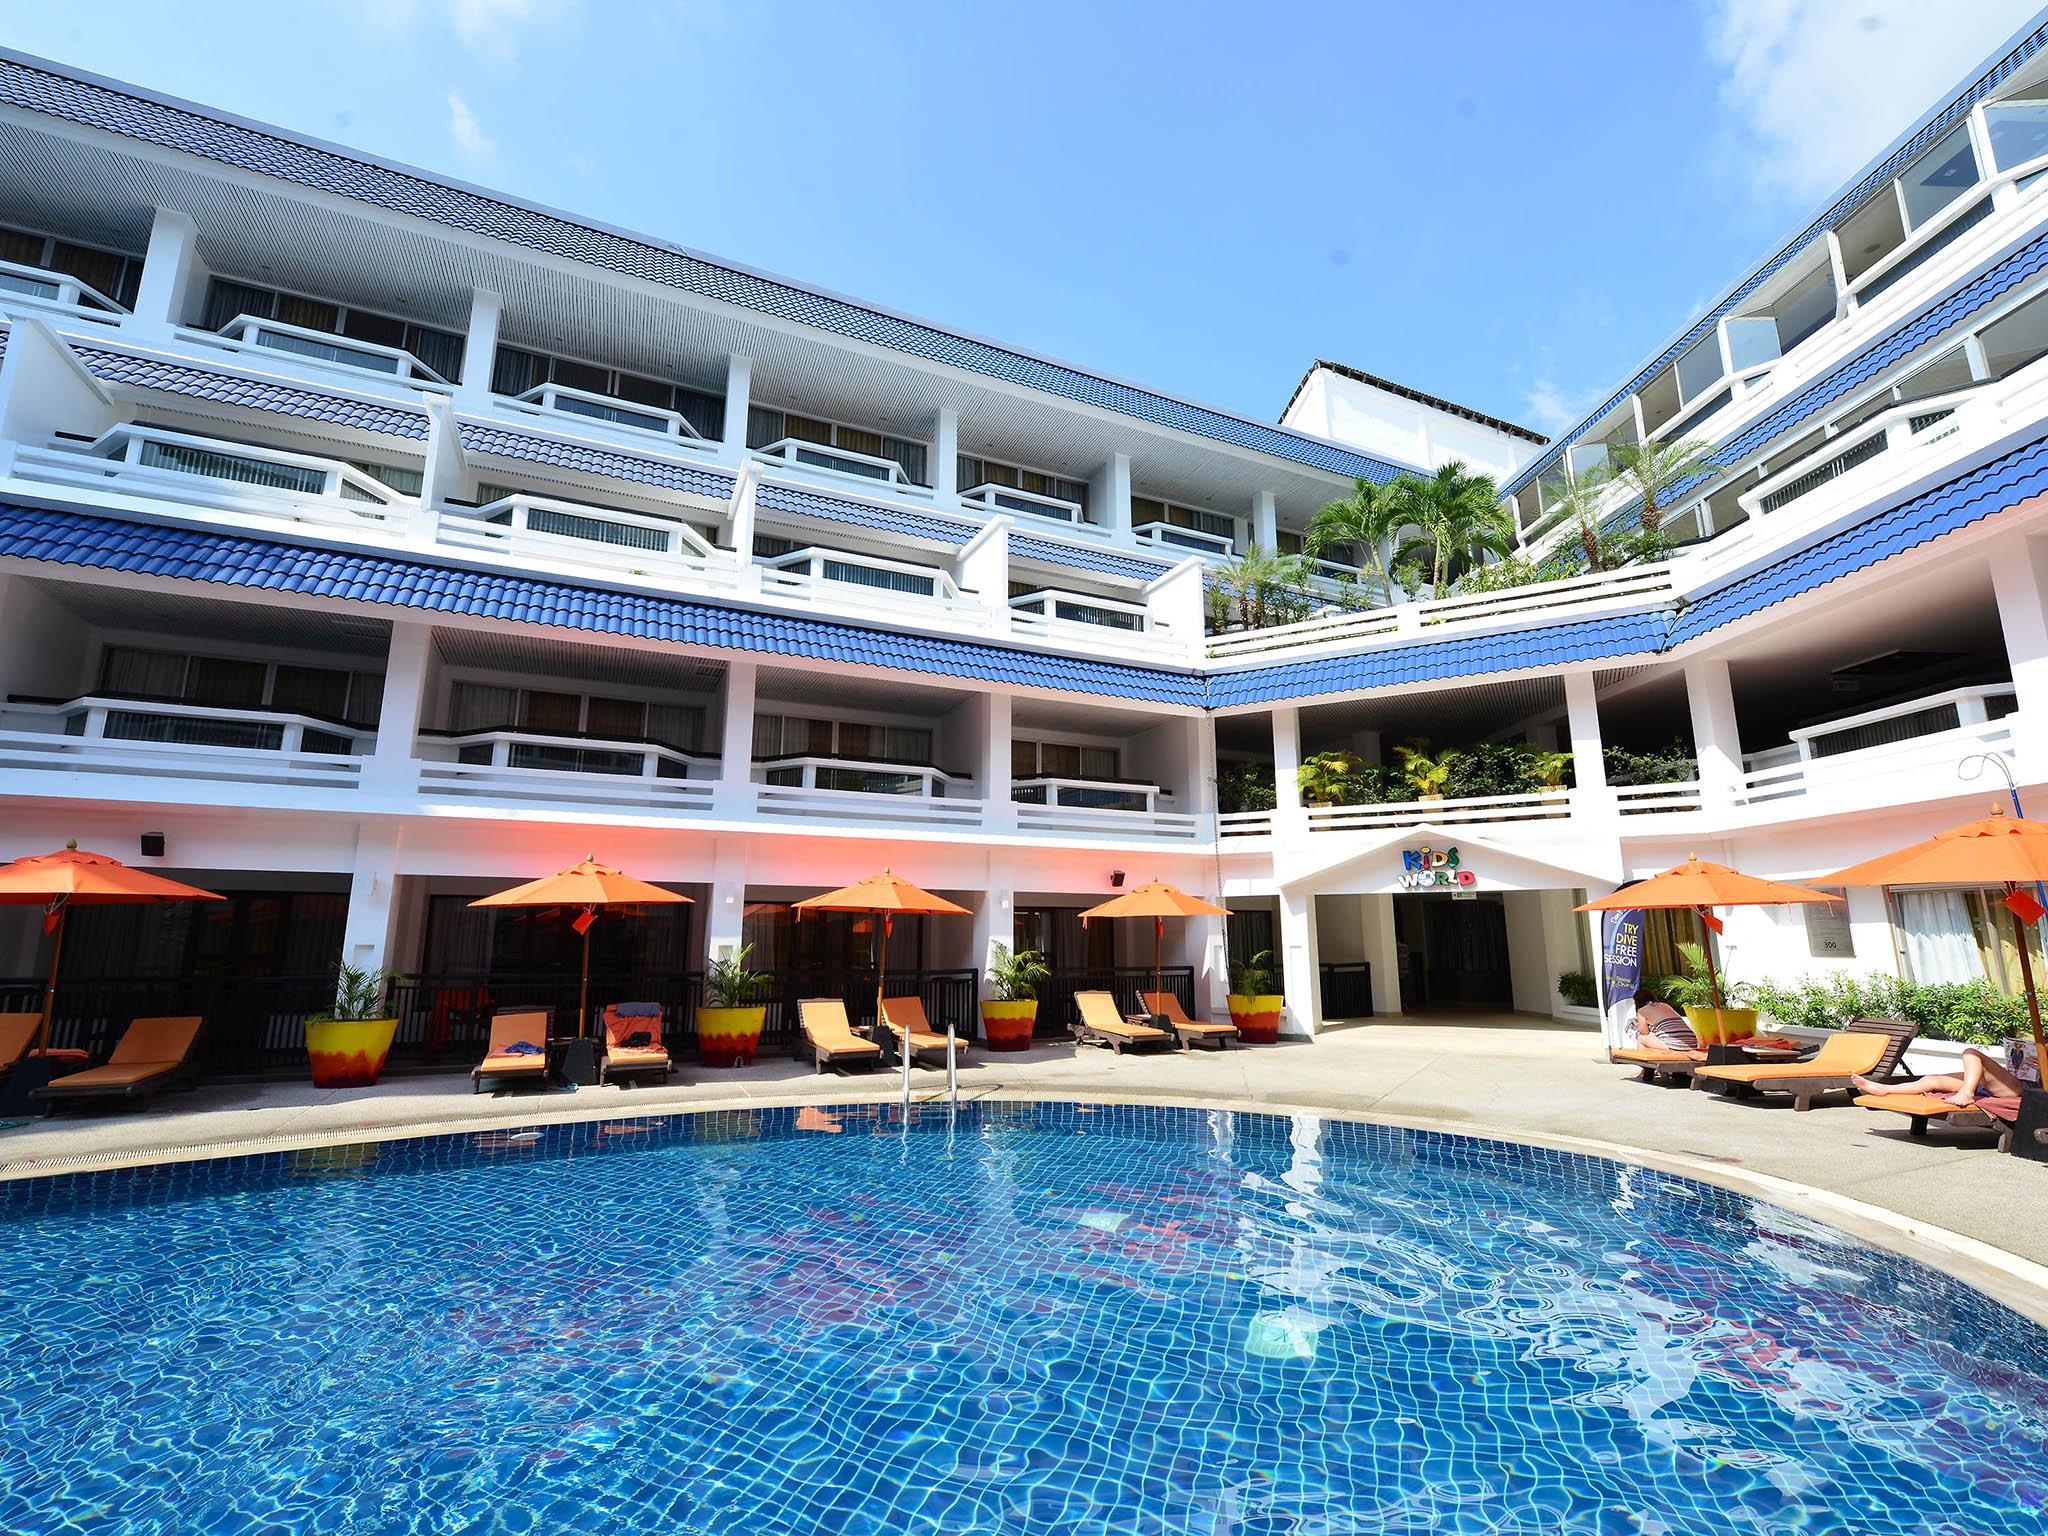 Patong Beach Hotel Phuket